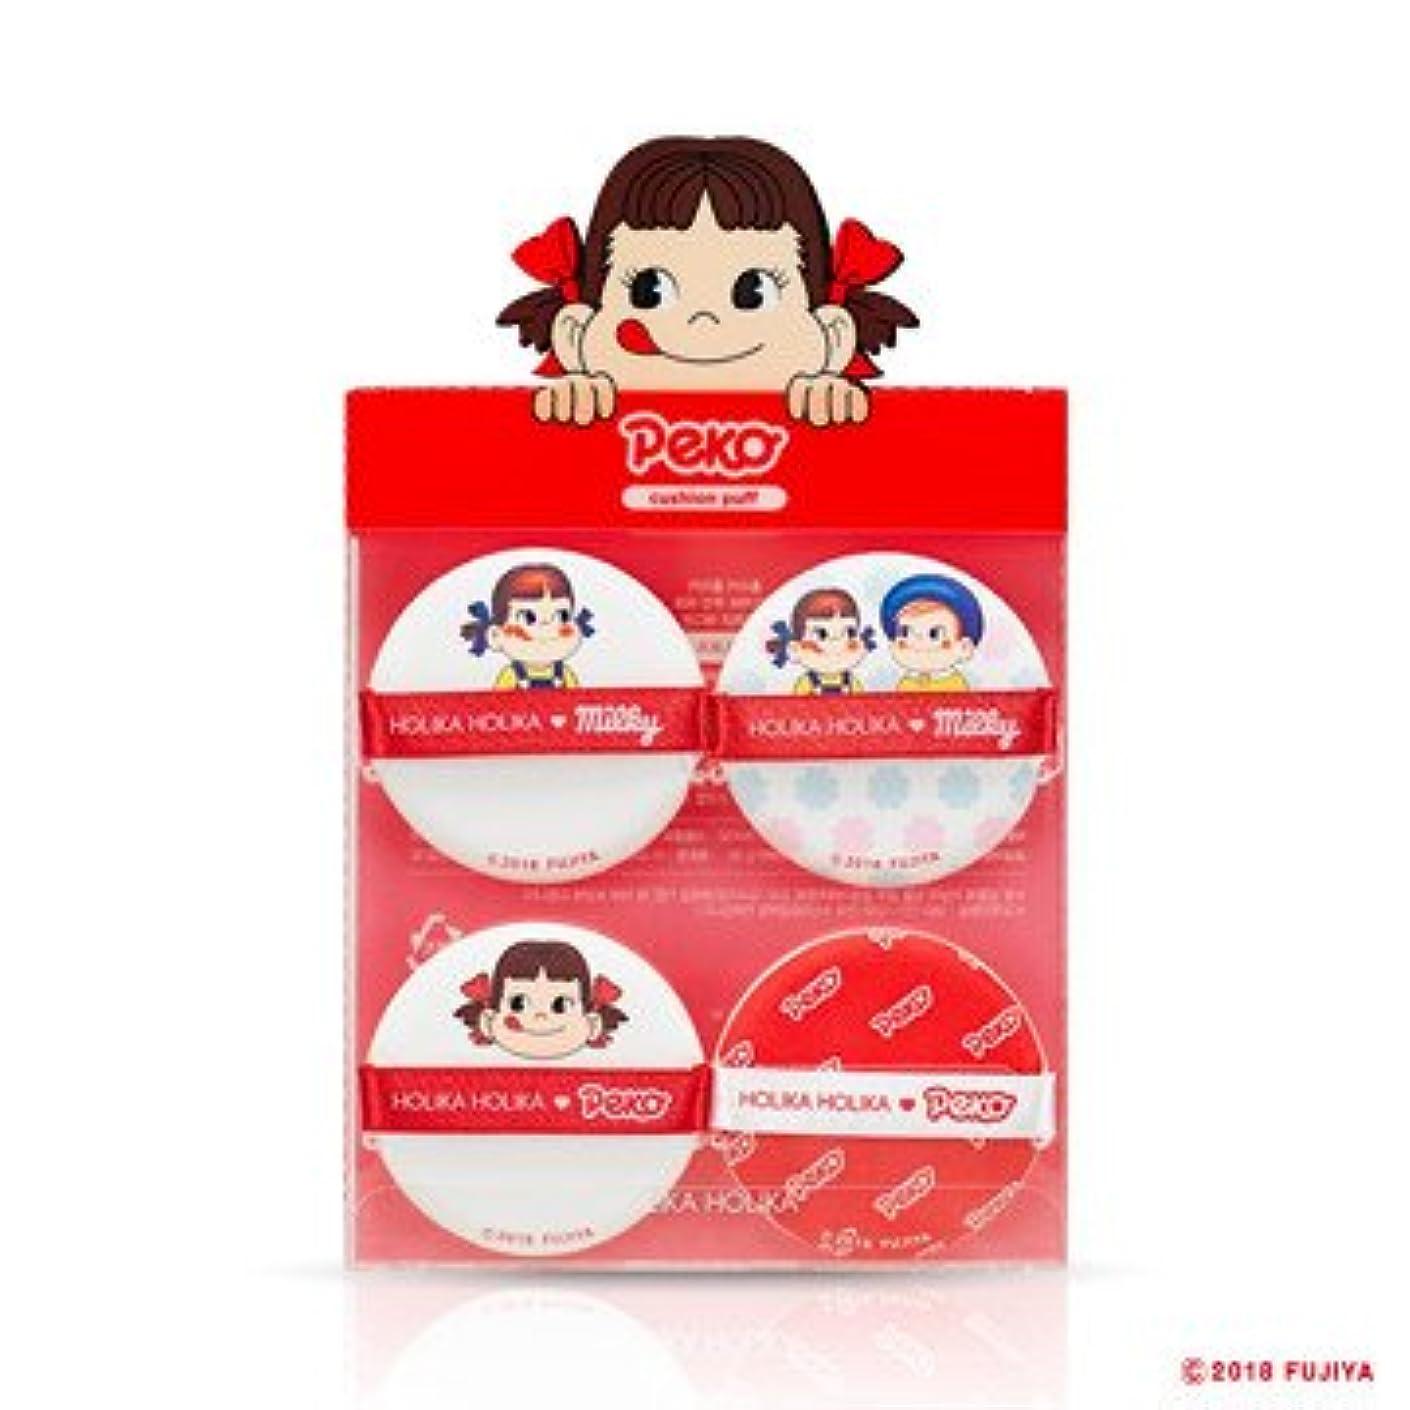 Holika Holika [Sweet Peko Edition] Hard Cover Cushion Puff(4EA)/ホリカホリカ [スイートペコエディション] ハードカバークッションパフ (4枚入り) [並行輸入品]